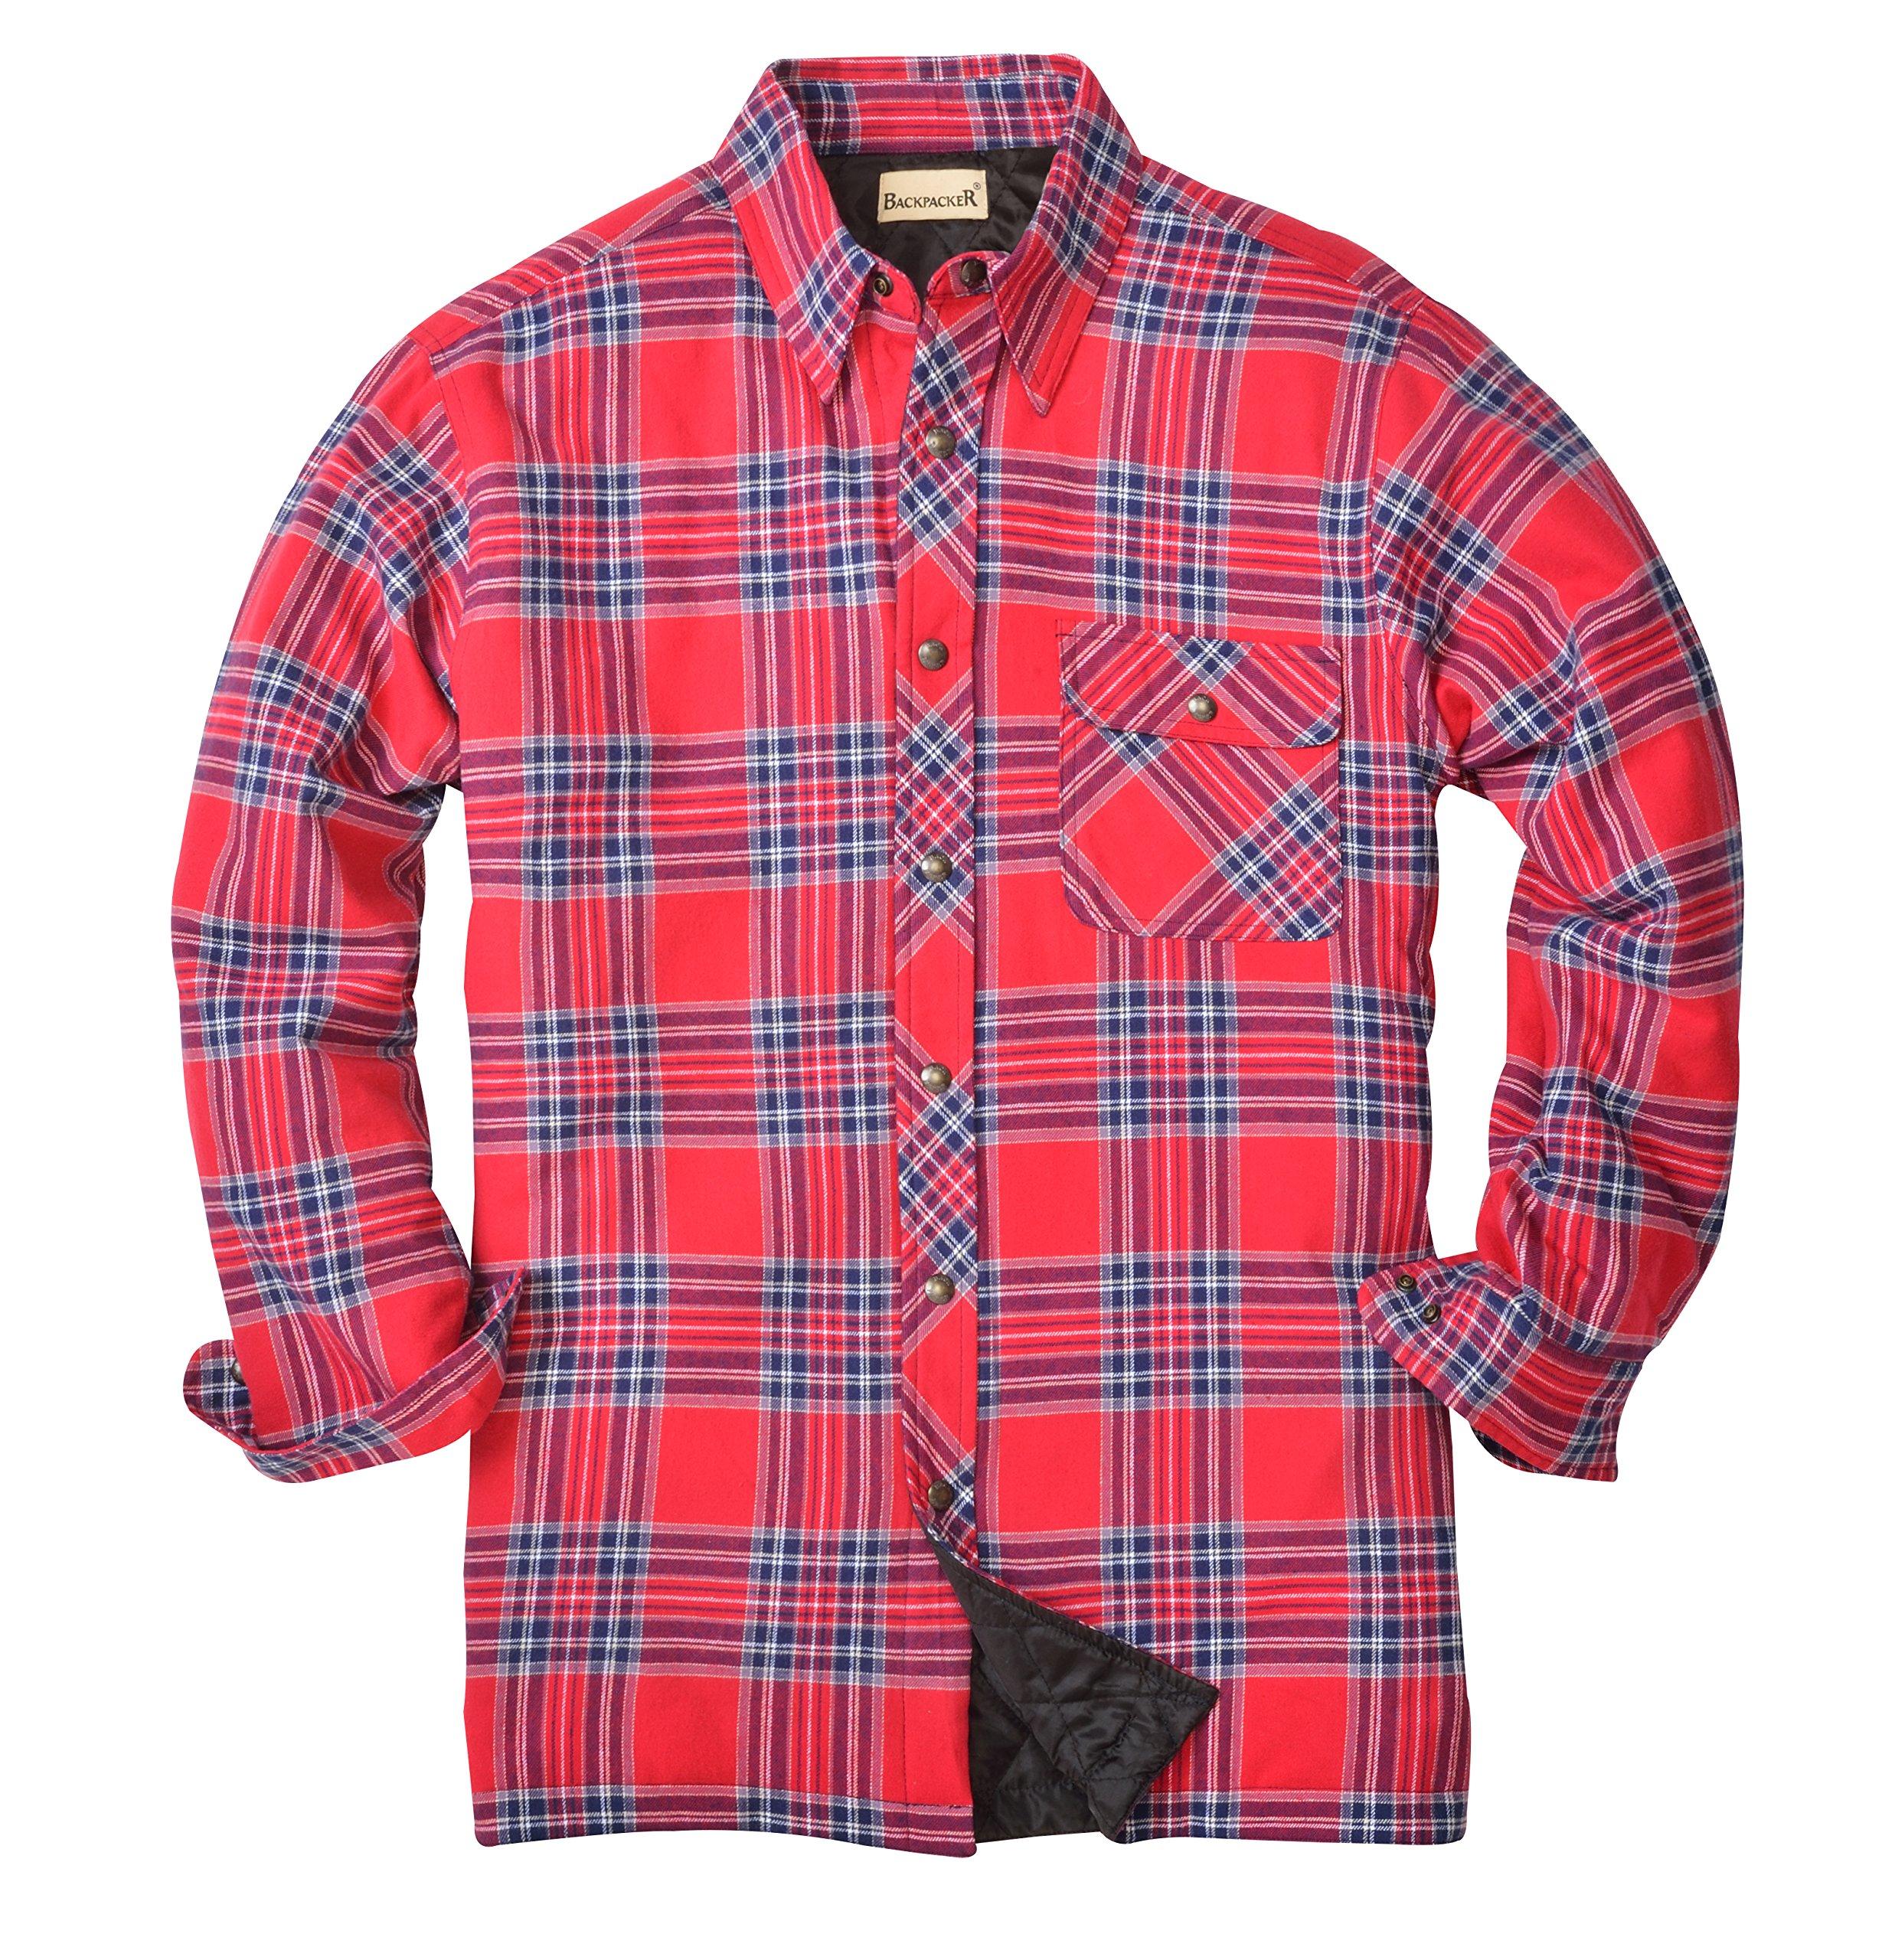 Backpacker Men's Flannel/Quilt Lined Shirt Jacket, Blue/Stuart, X-Large by Backpacker